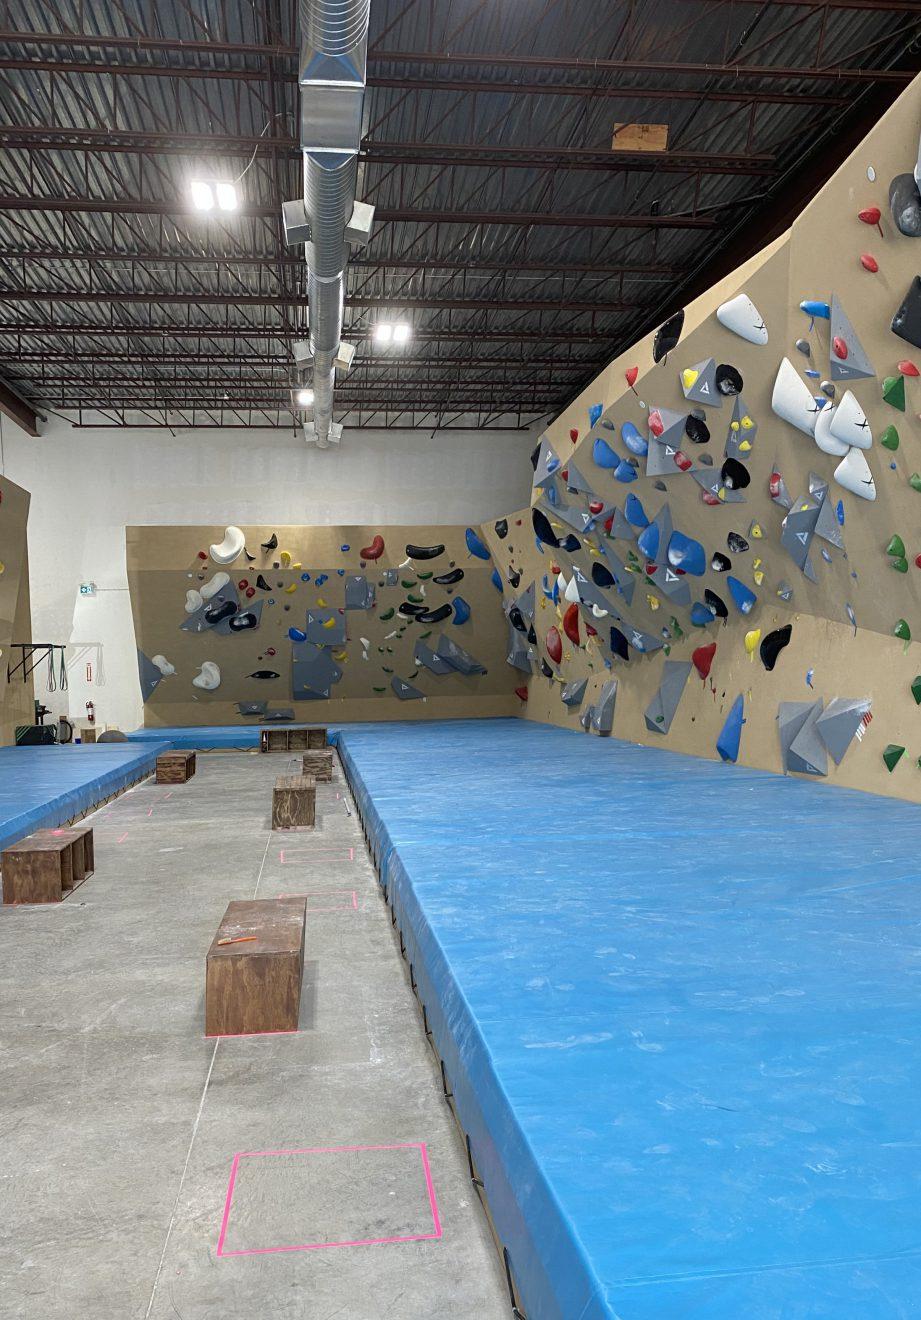 Bouldering walls at The Boiler Room.